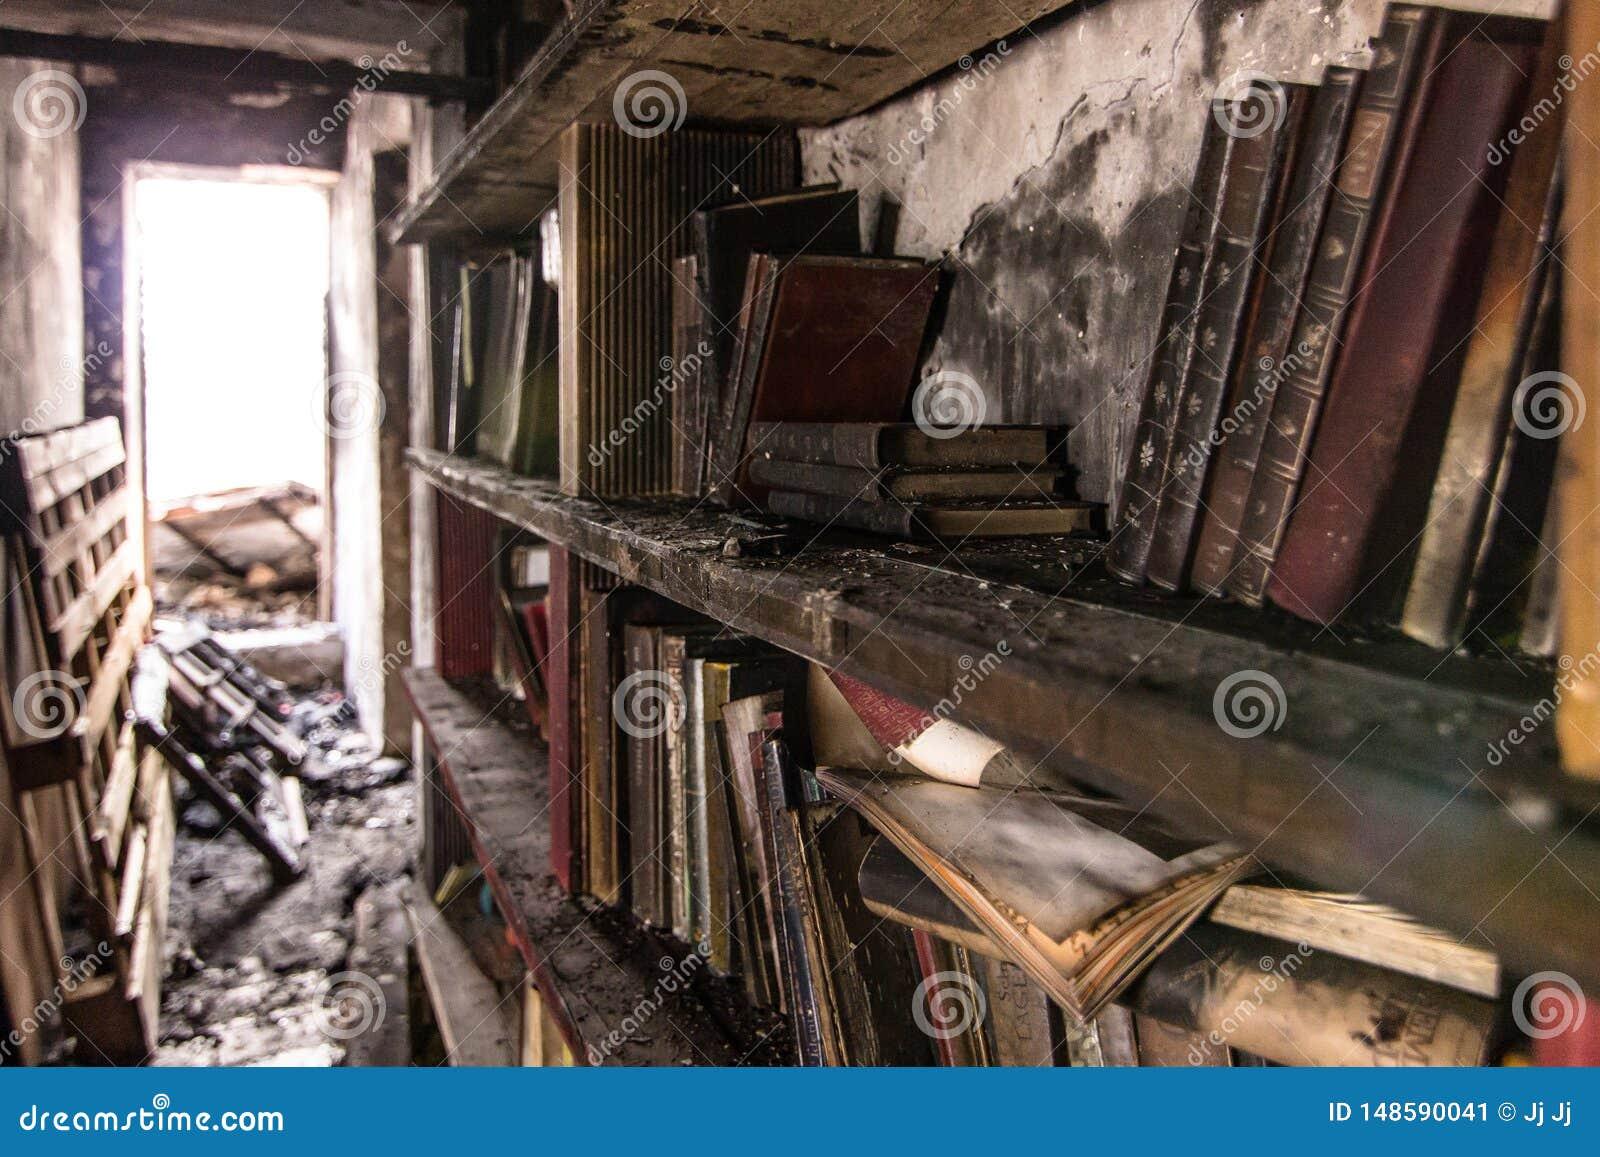 Boken brände i en bokhylla efter en brand